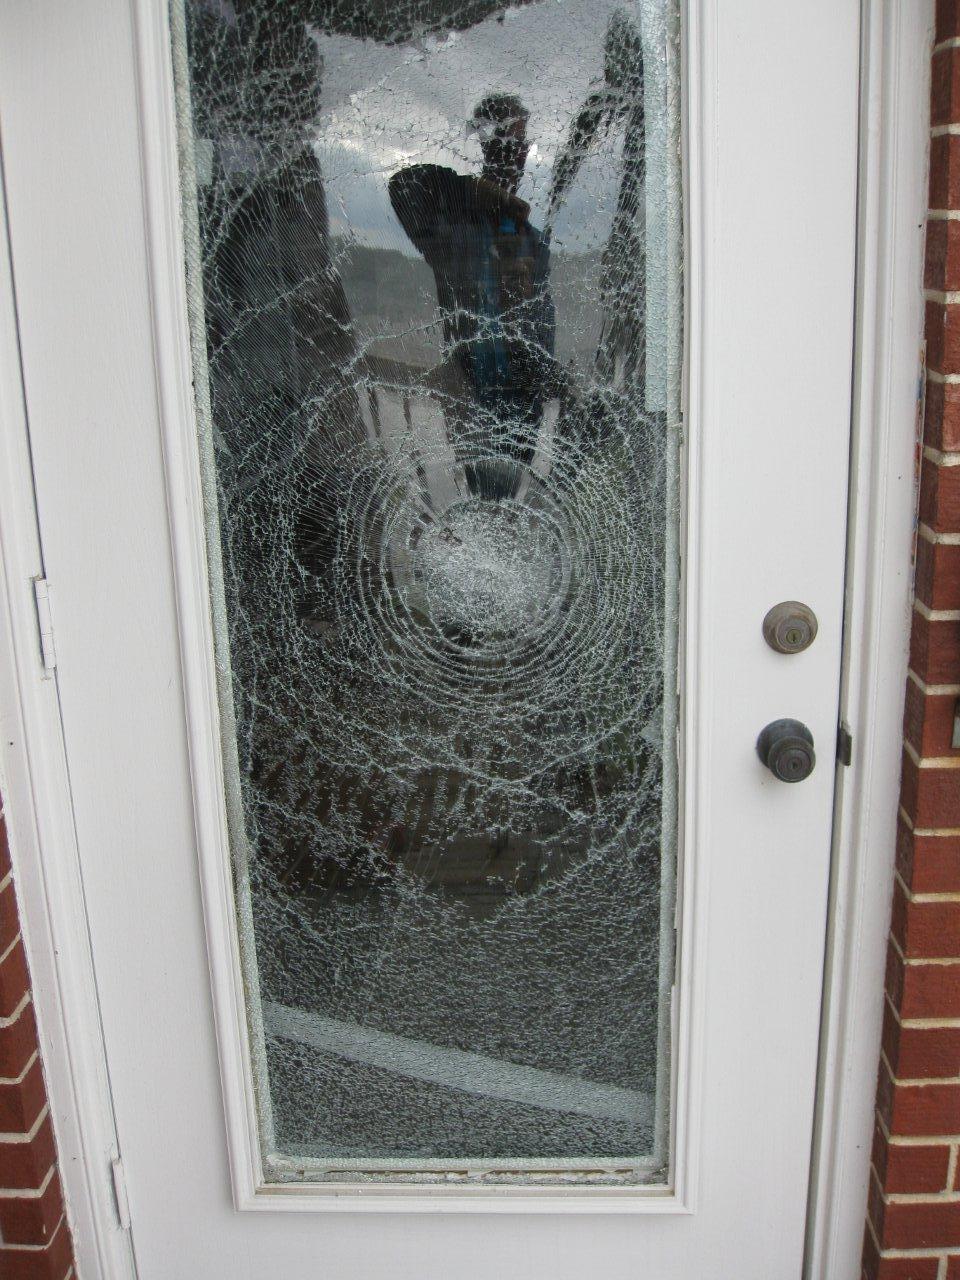 Armor Glass 174 Blog Burglar Meets Armor Glass Security Film